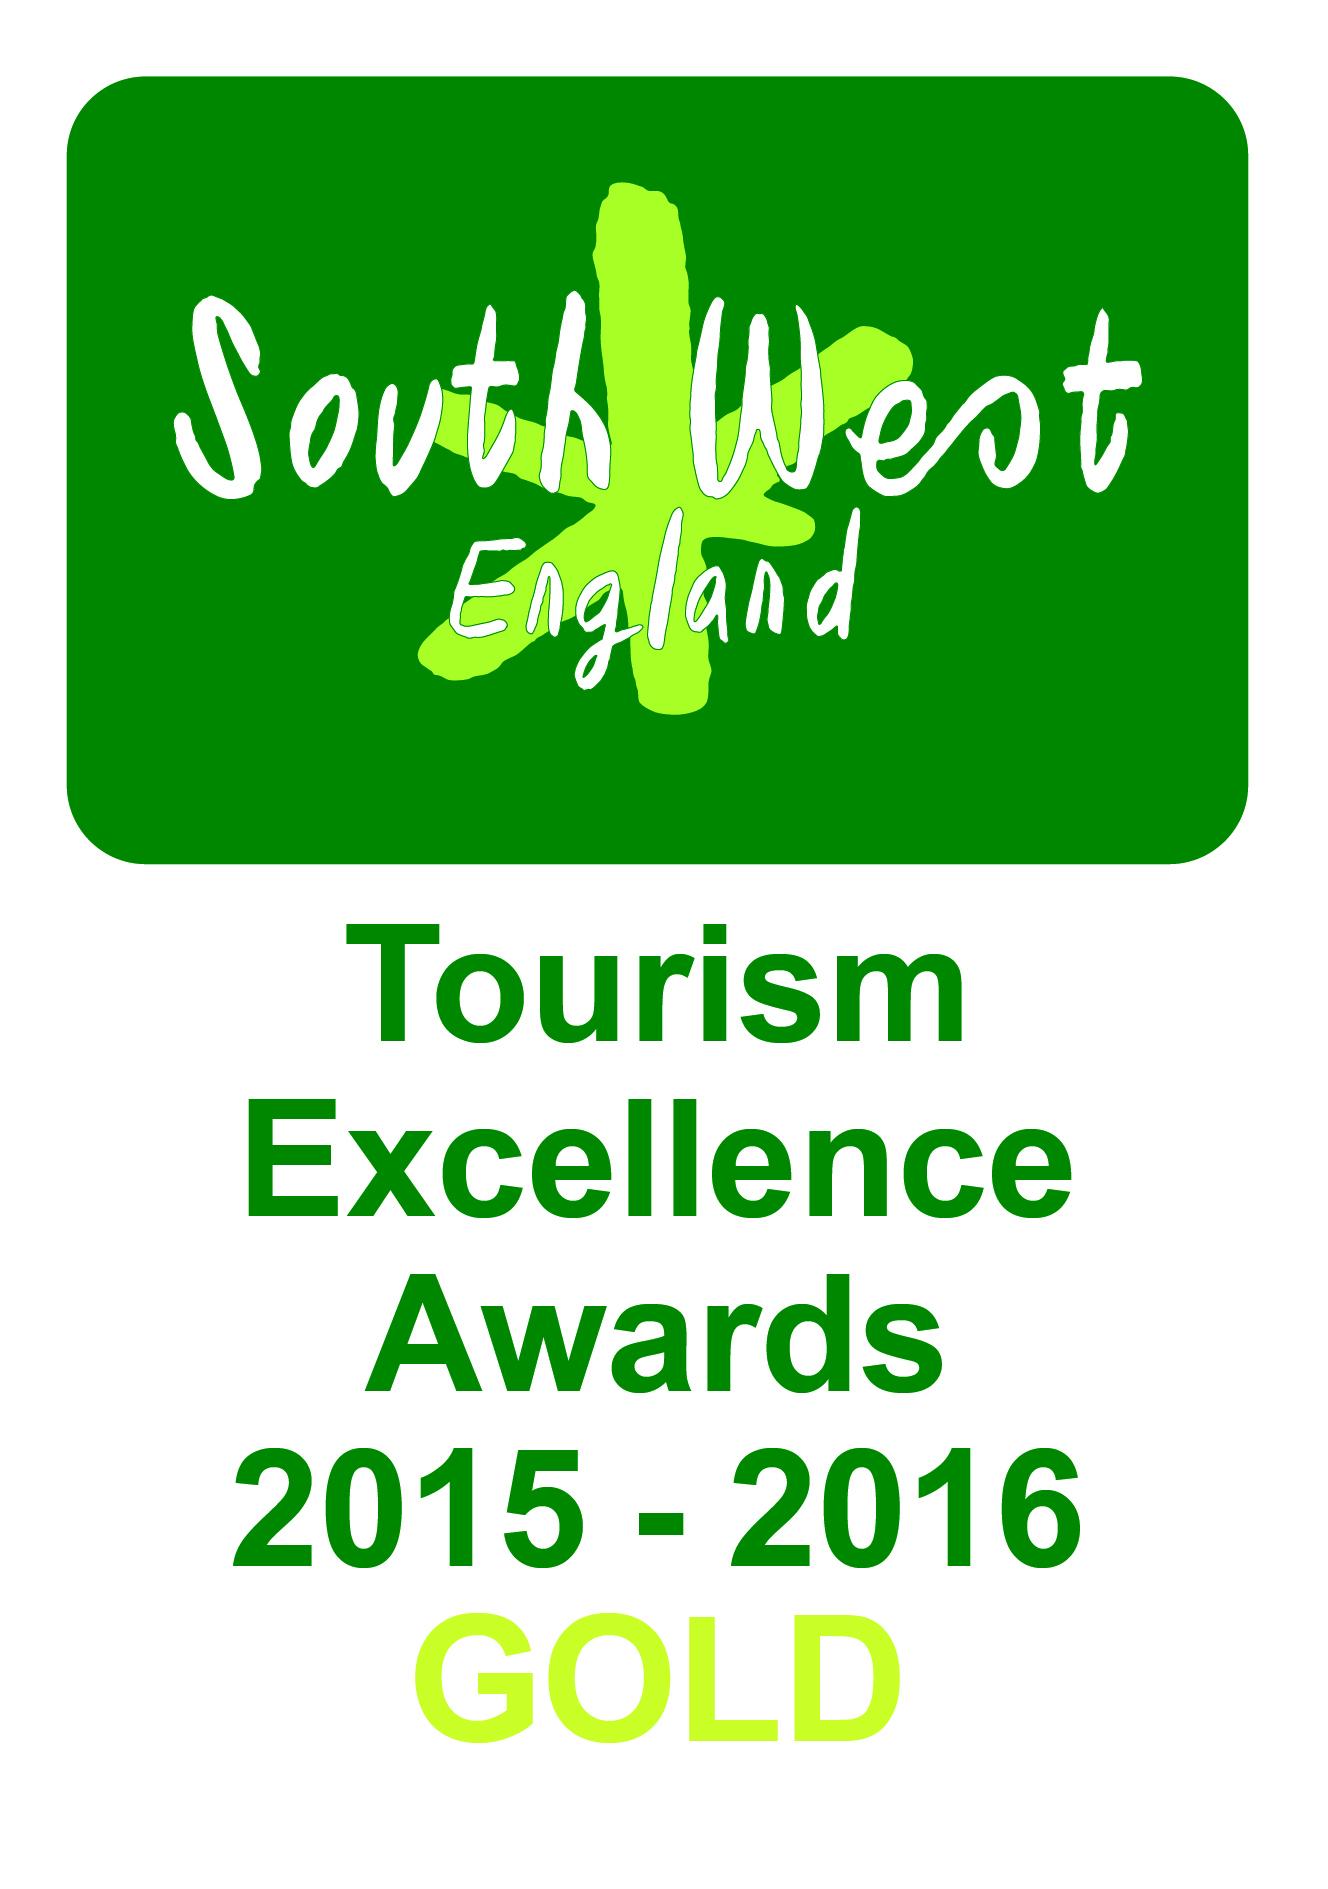 South West Tourism Gold Award